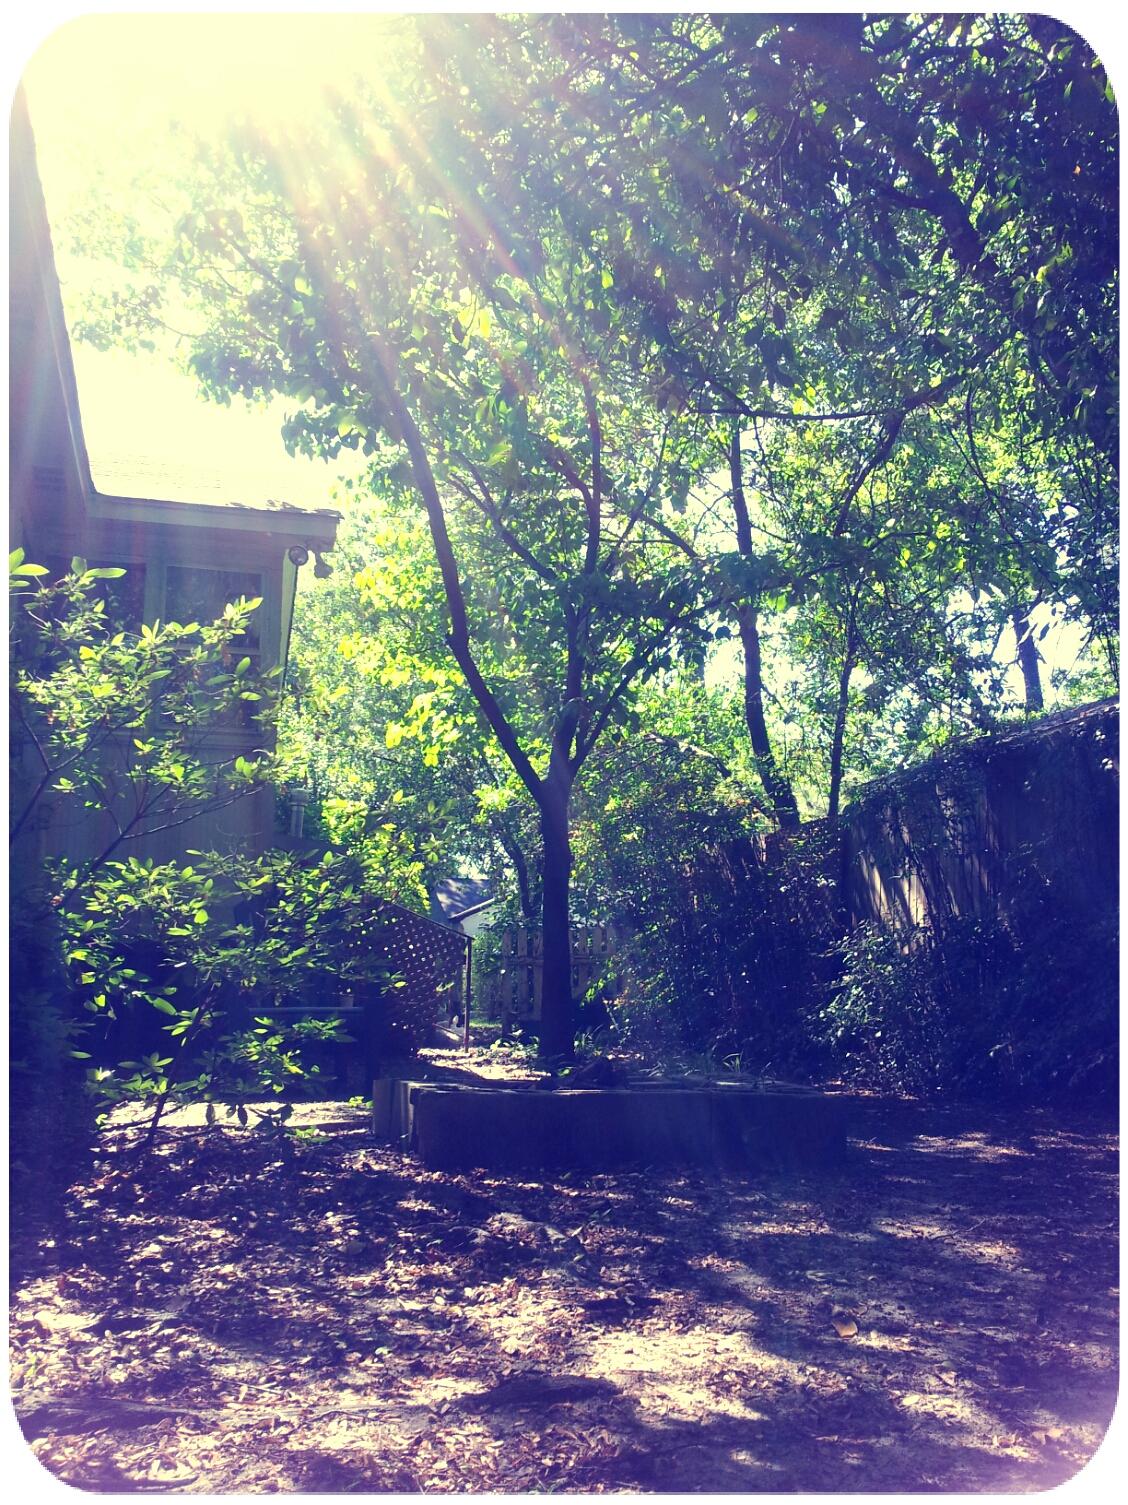 2012-04-07 15.44.15_Josh_Round.jpg